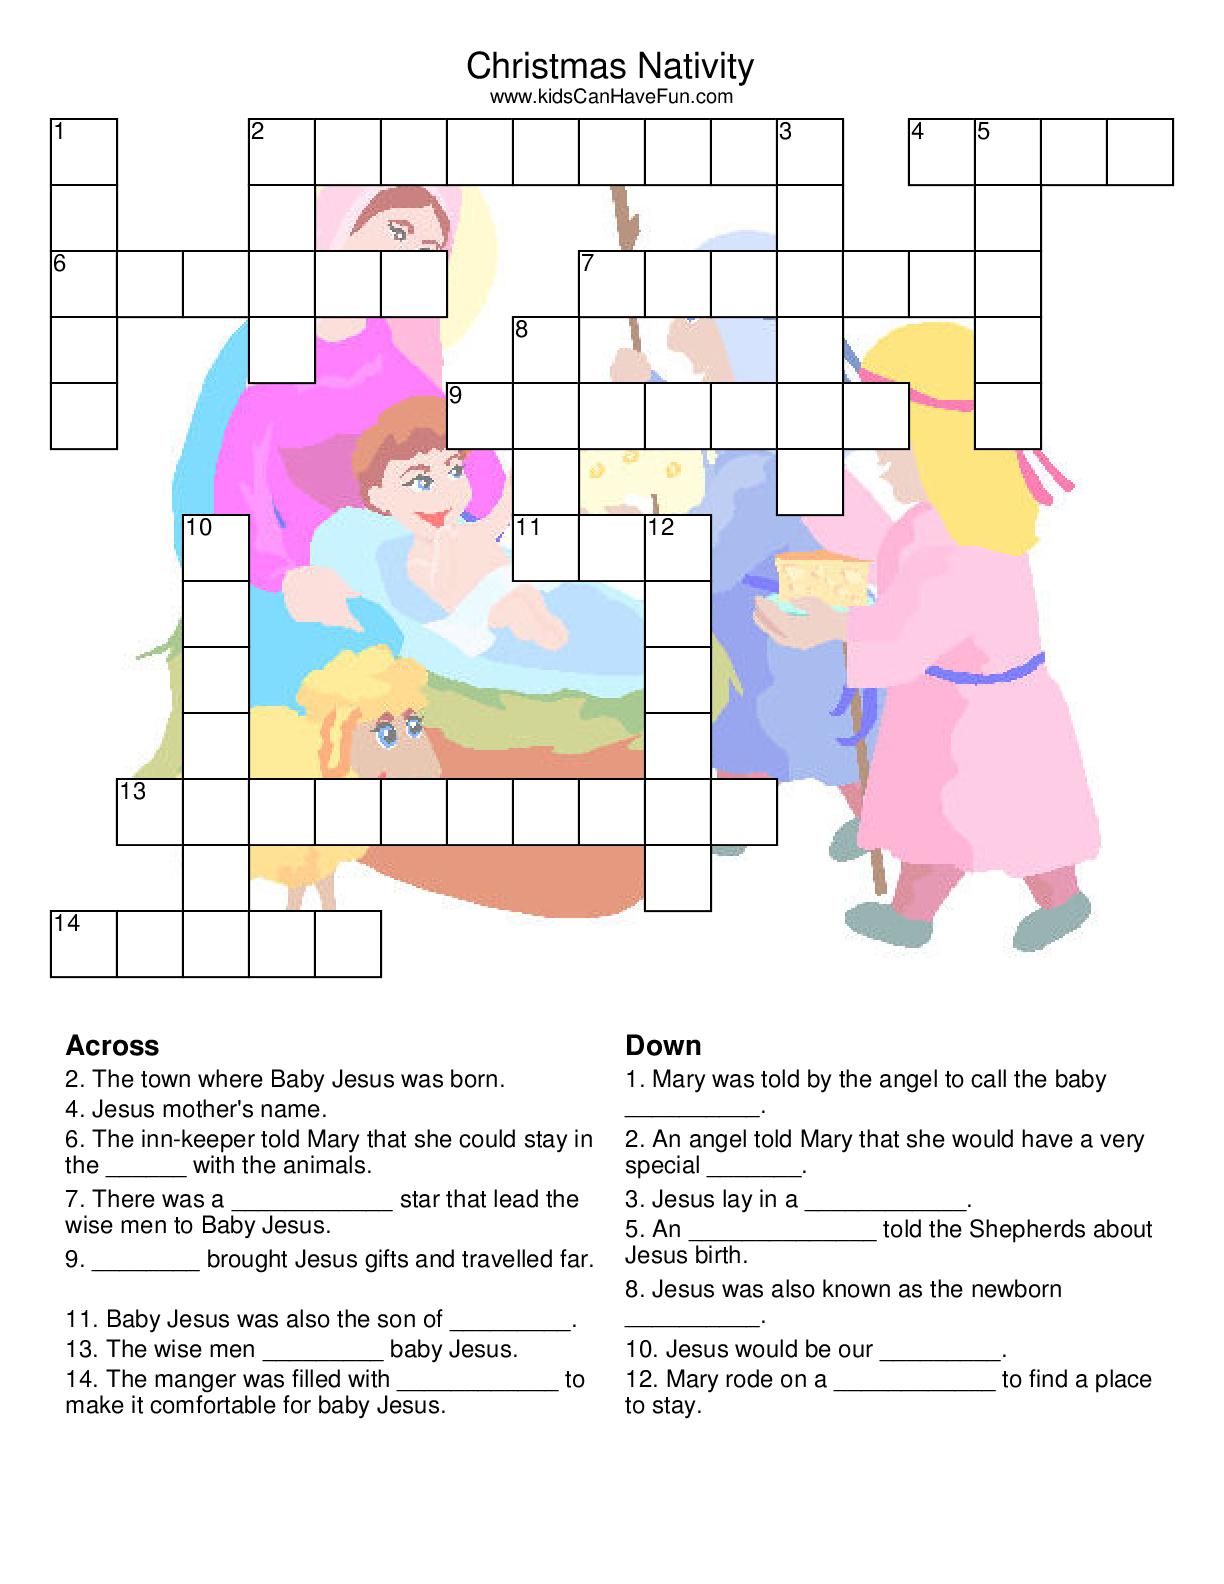 Christmas Nativity Crossword | Christmas-Nativity | Christmas - Printable Nativity Puzzle